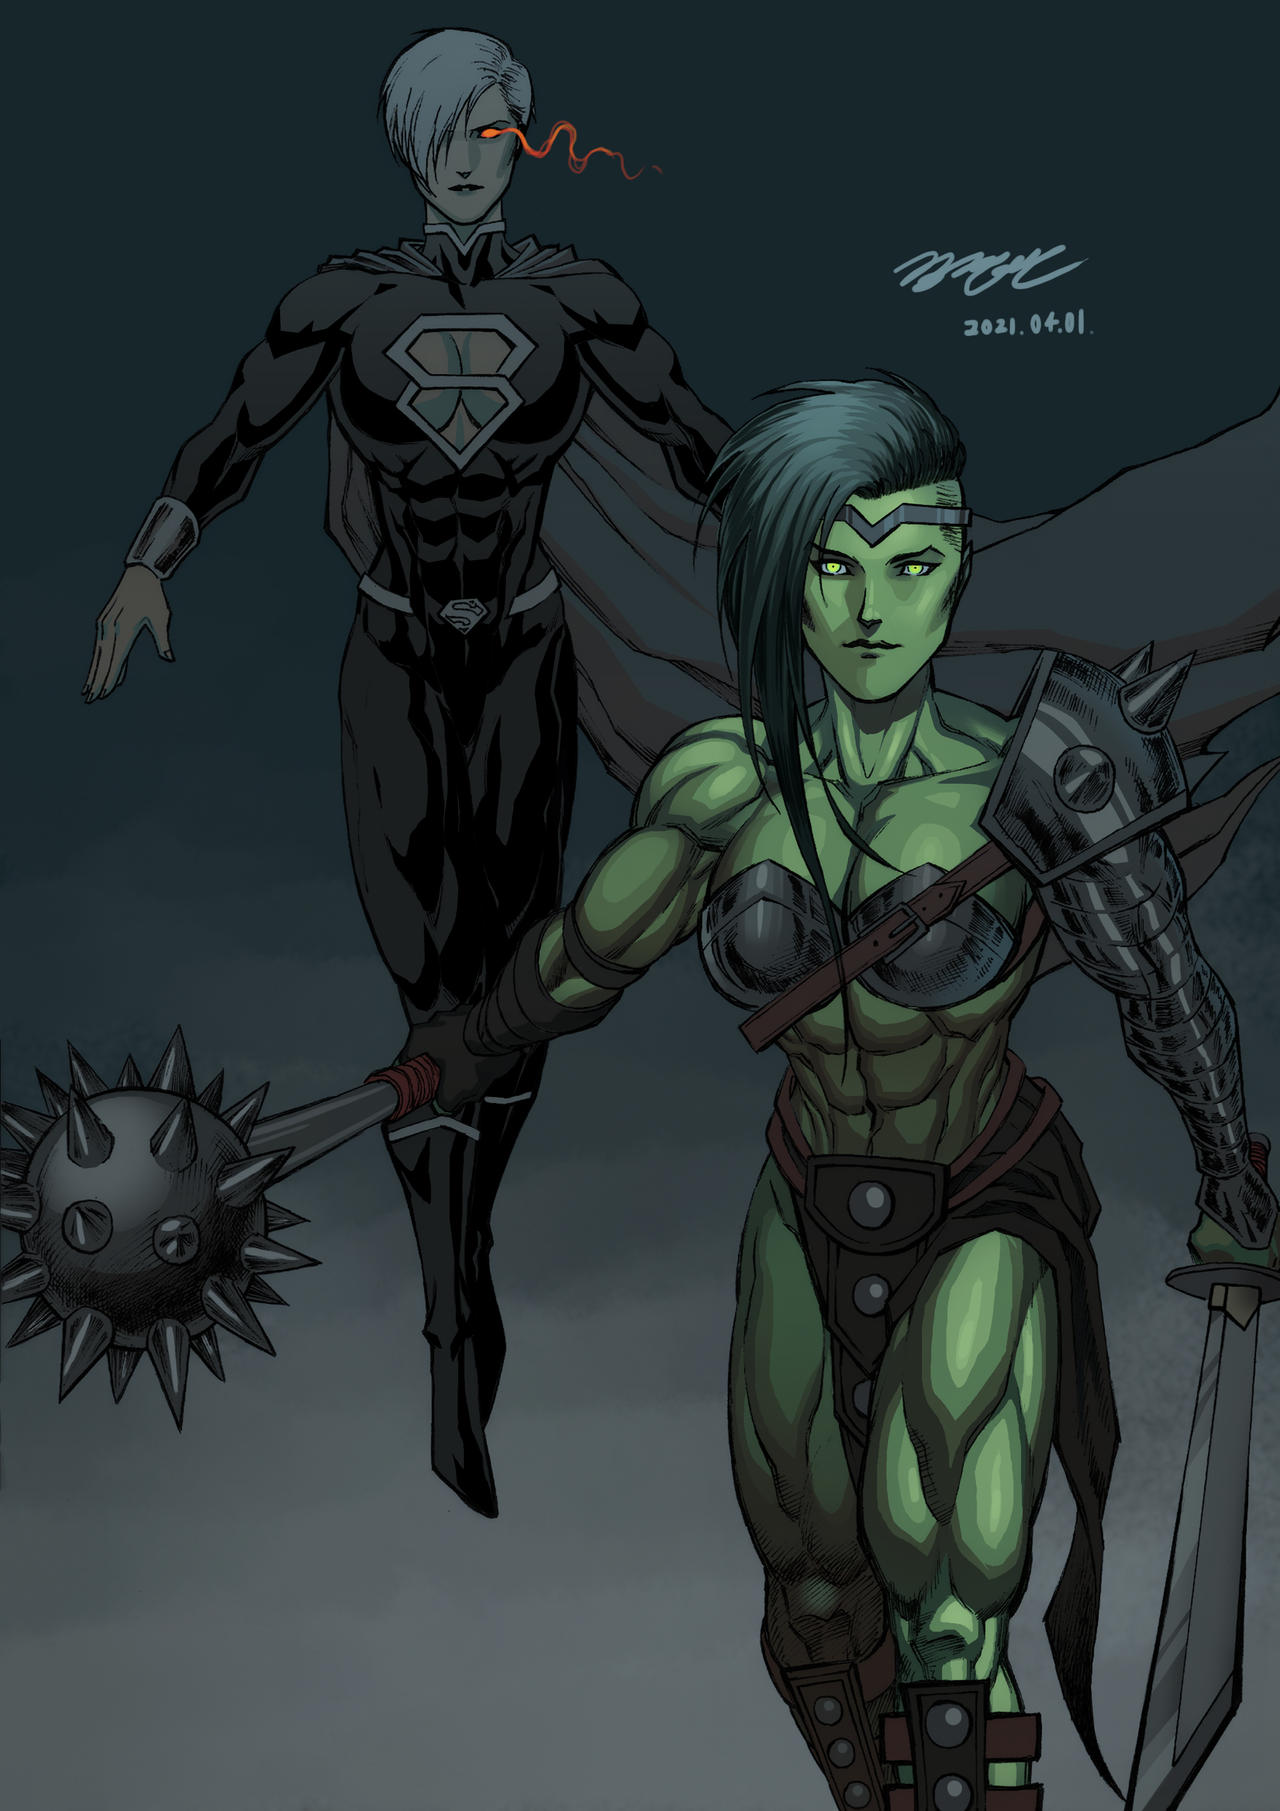 She-Hulk and Power Girl: Costume Change